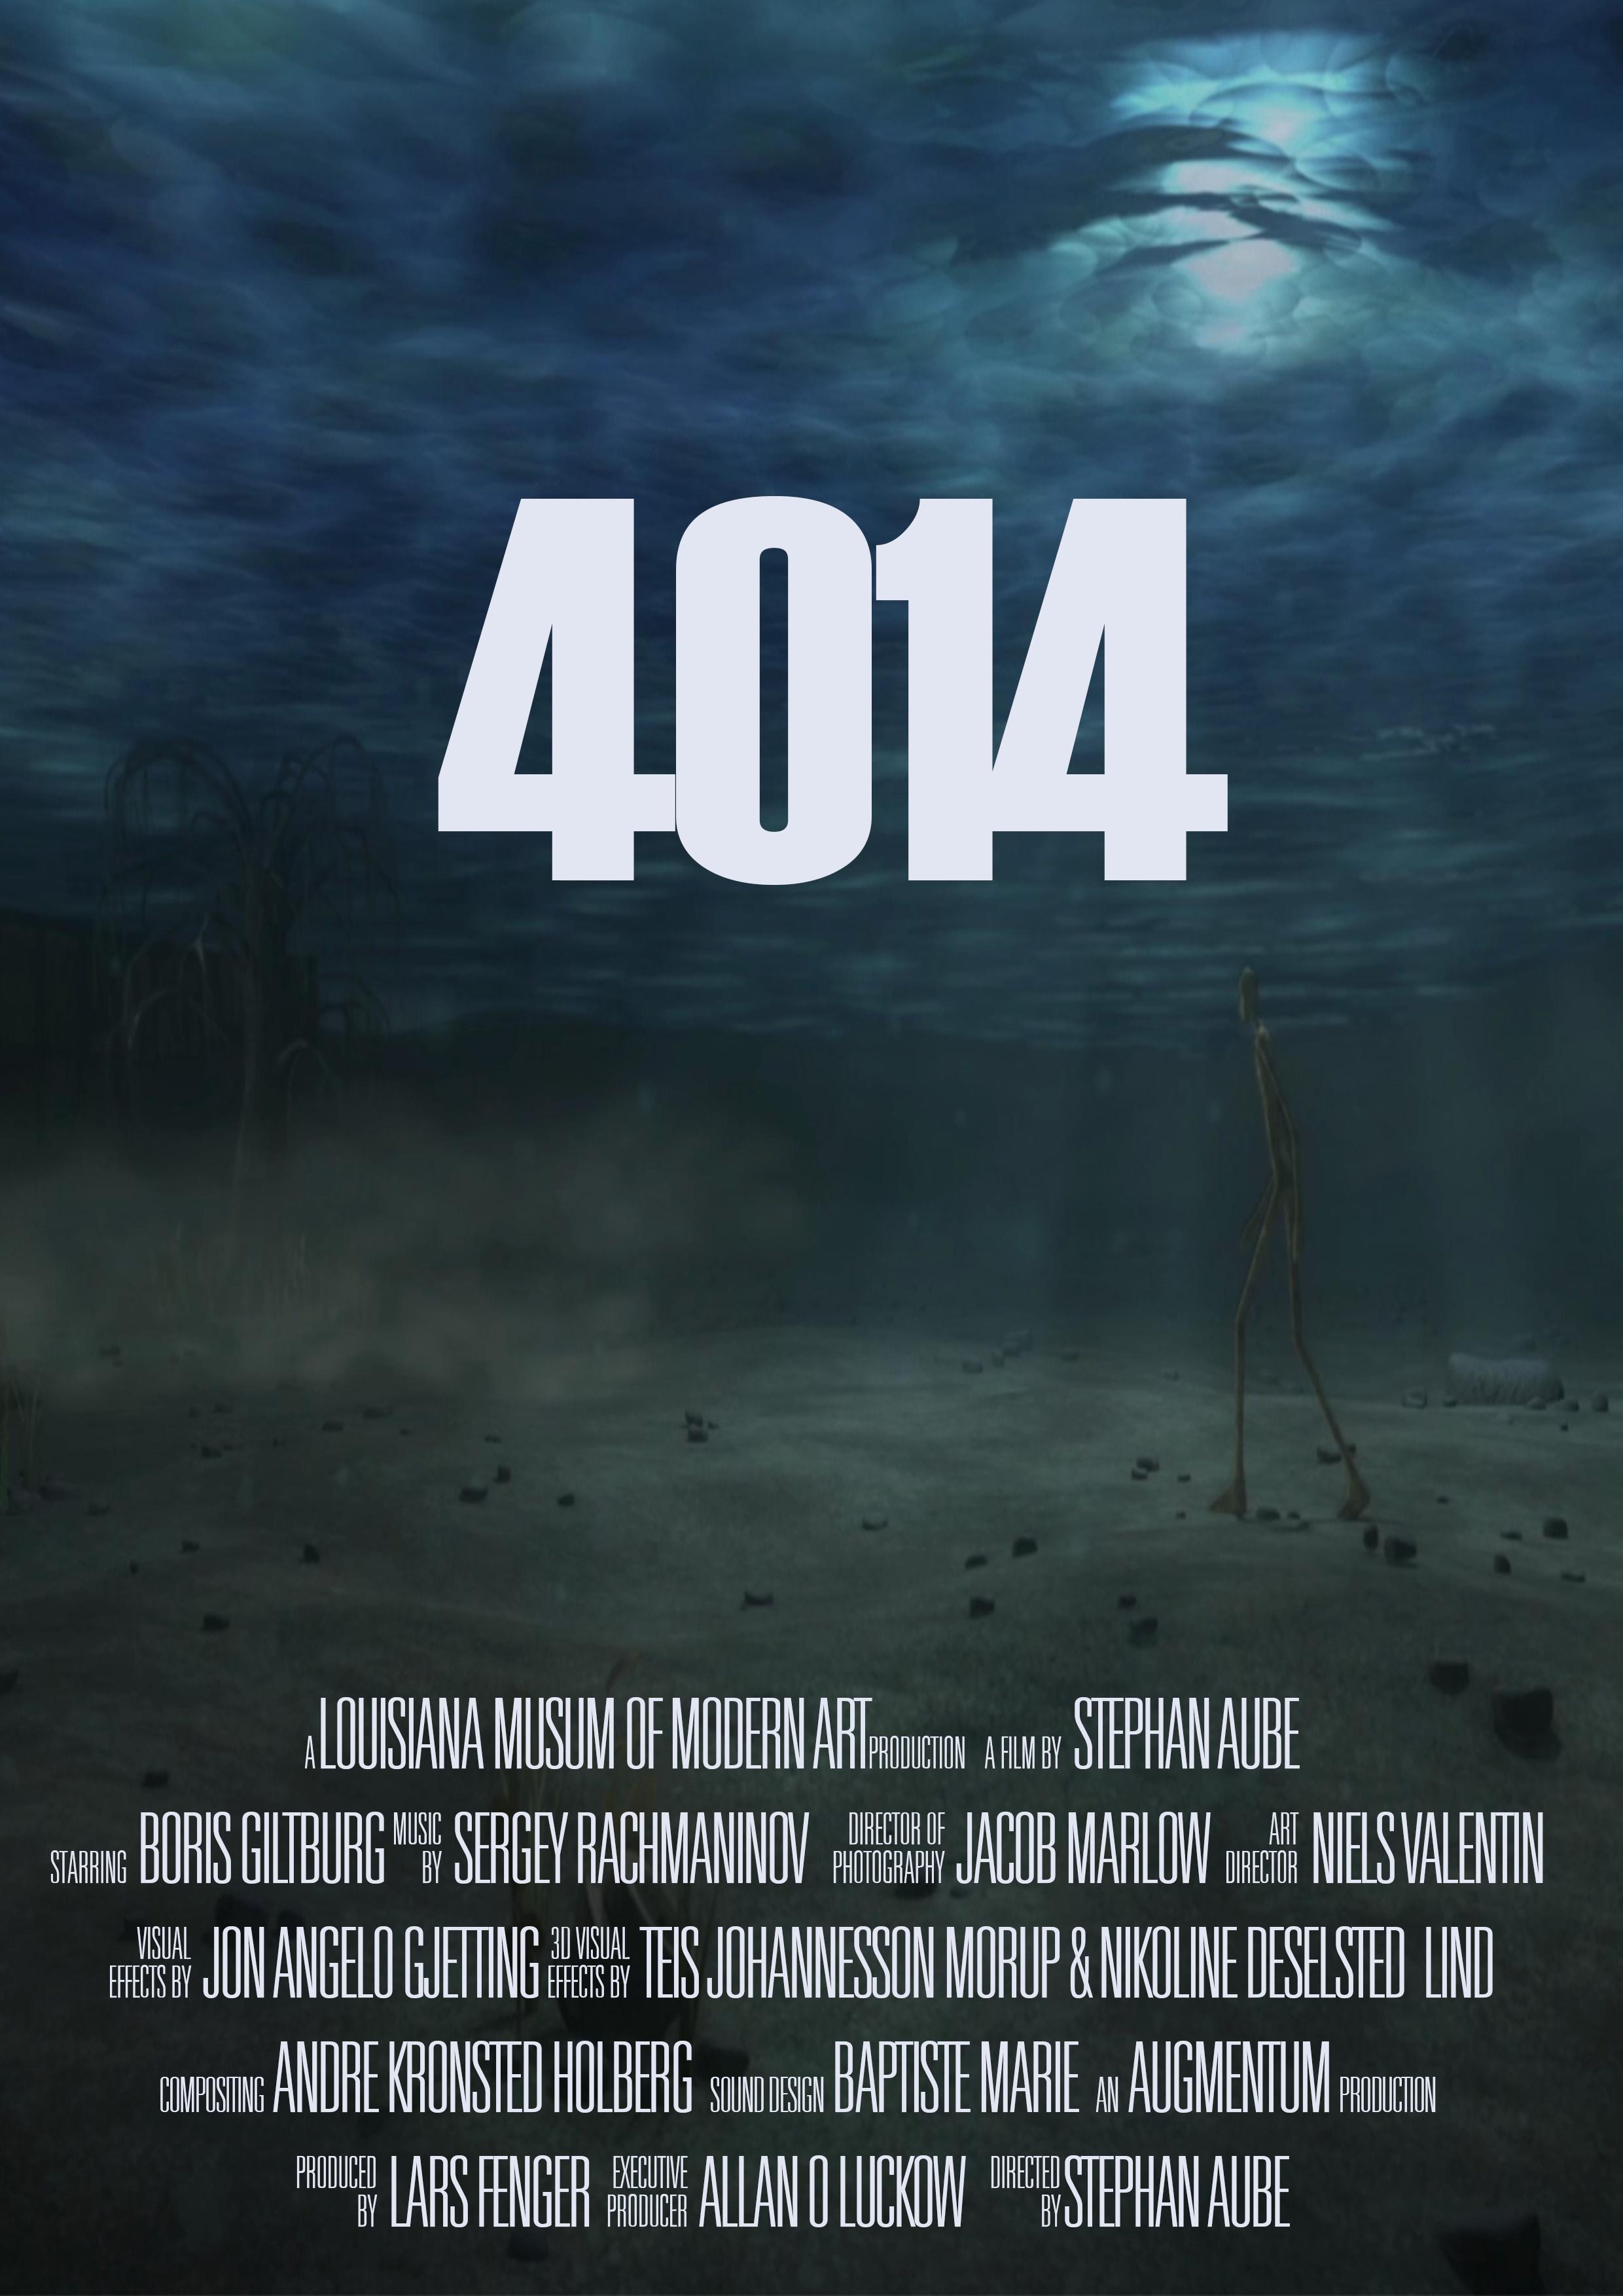 4014 (2014)